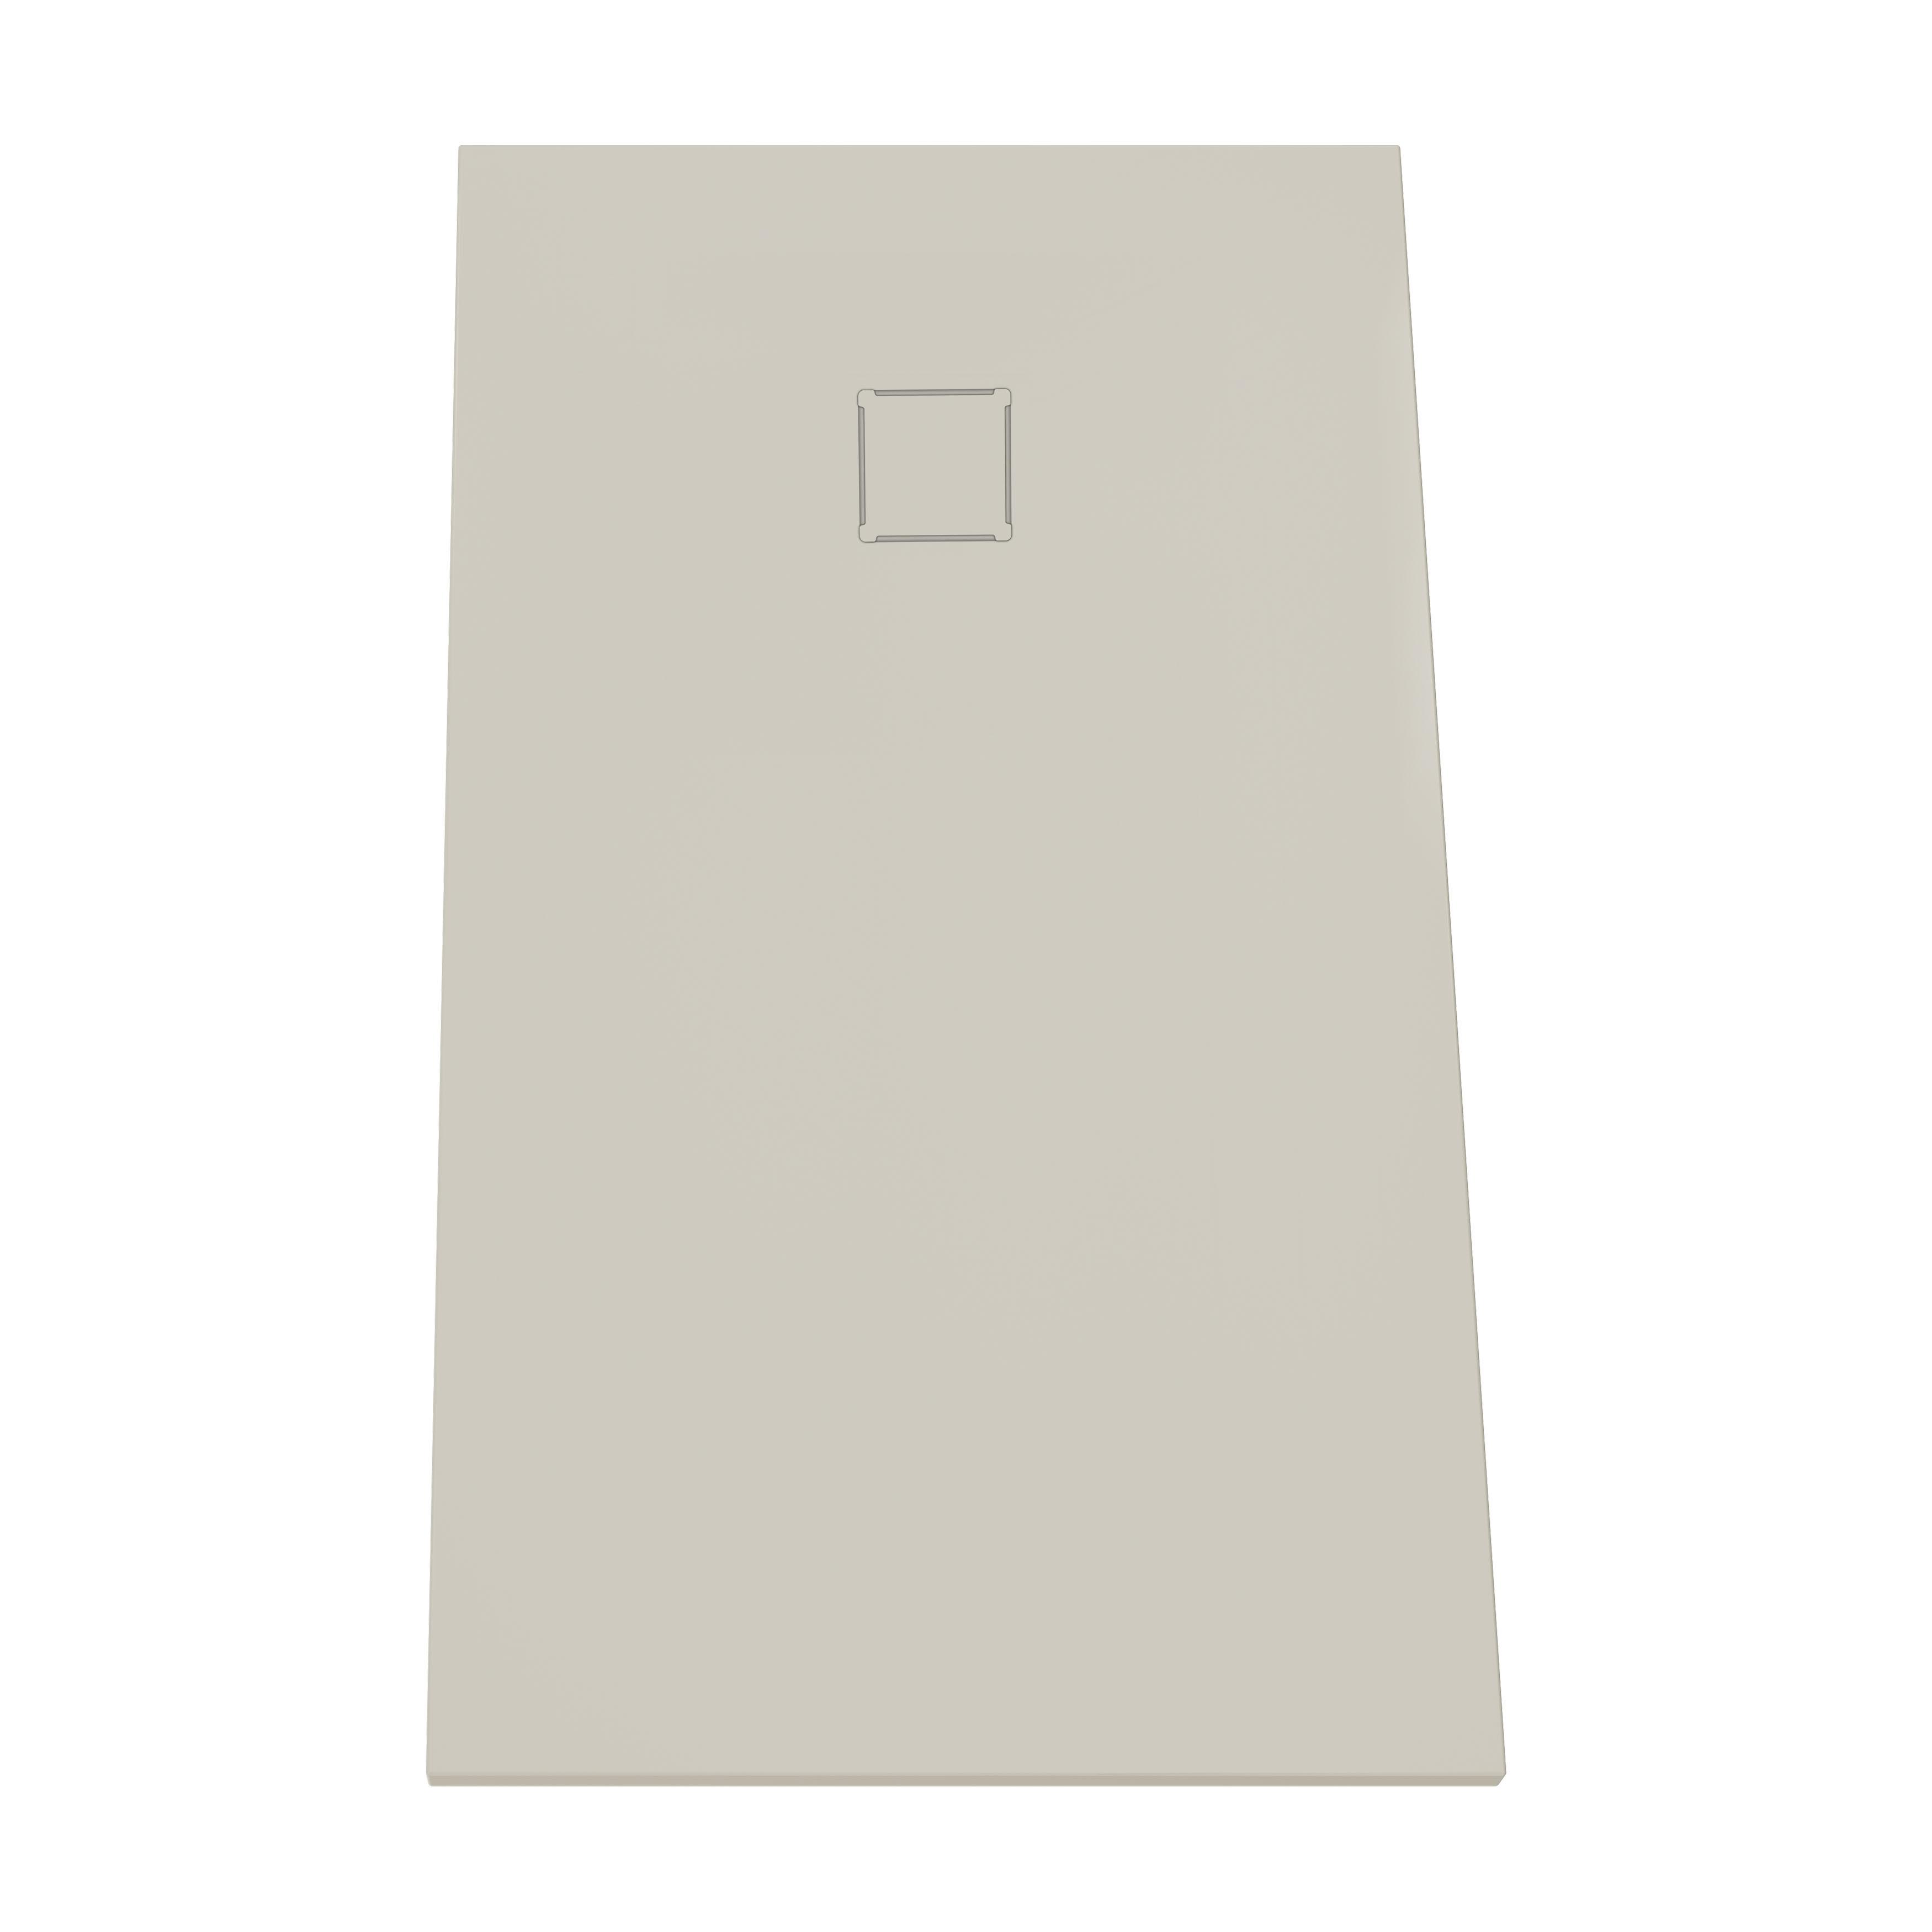 V-stone, receveur ultra plat en solid stone, 160  x  70 cm, taupe